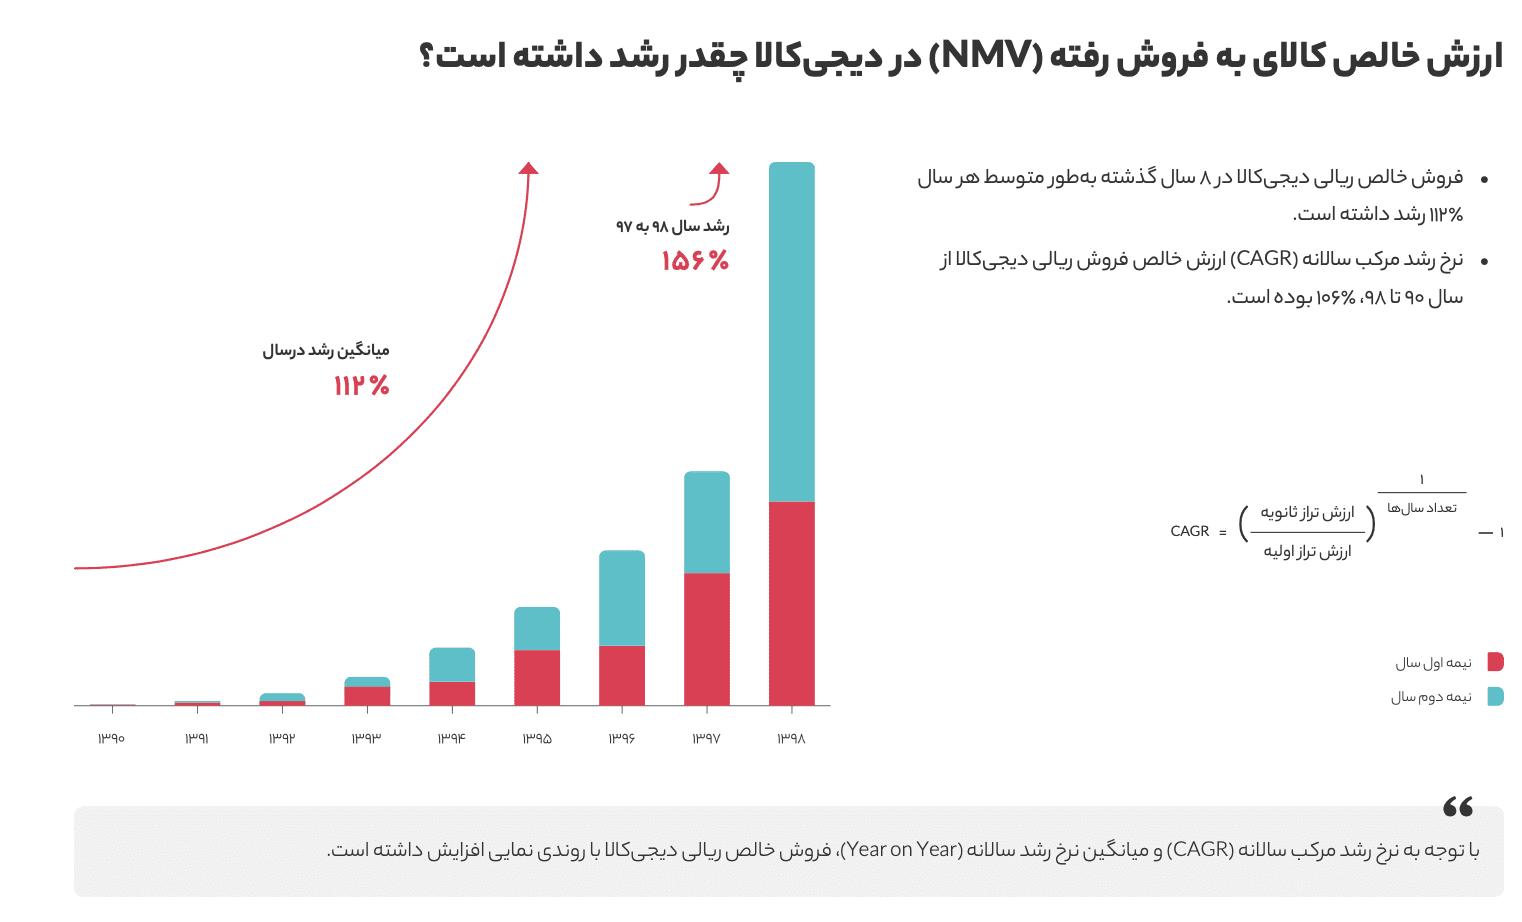 Screen Shot 1399 04 30 at 10.27.27 گزارش سال ۱۳۹۸ دیجیکالا منتشر شد؛ در بزرگترین فروشگاه آنلاین ایران چه میگذرد؟ اخبار IT